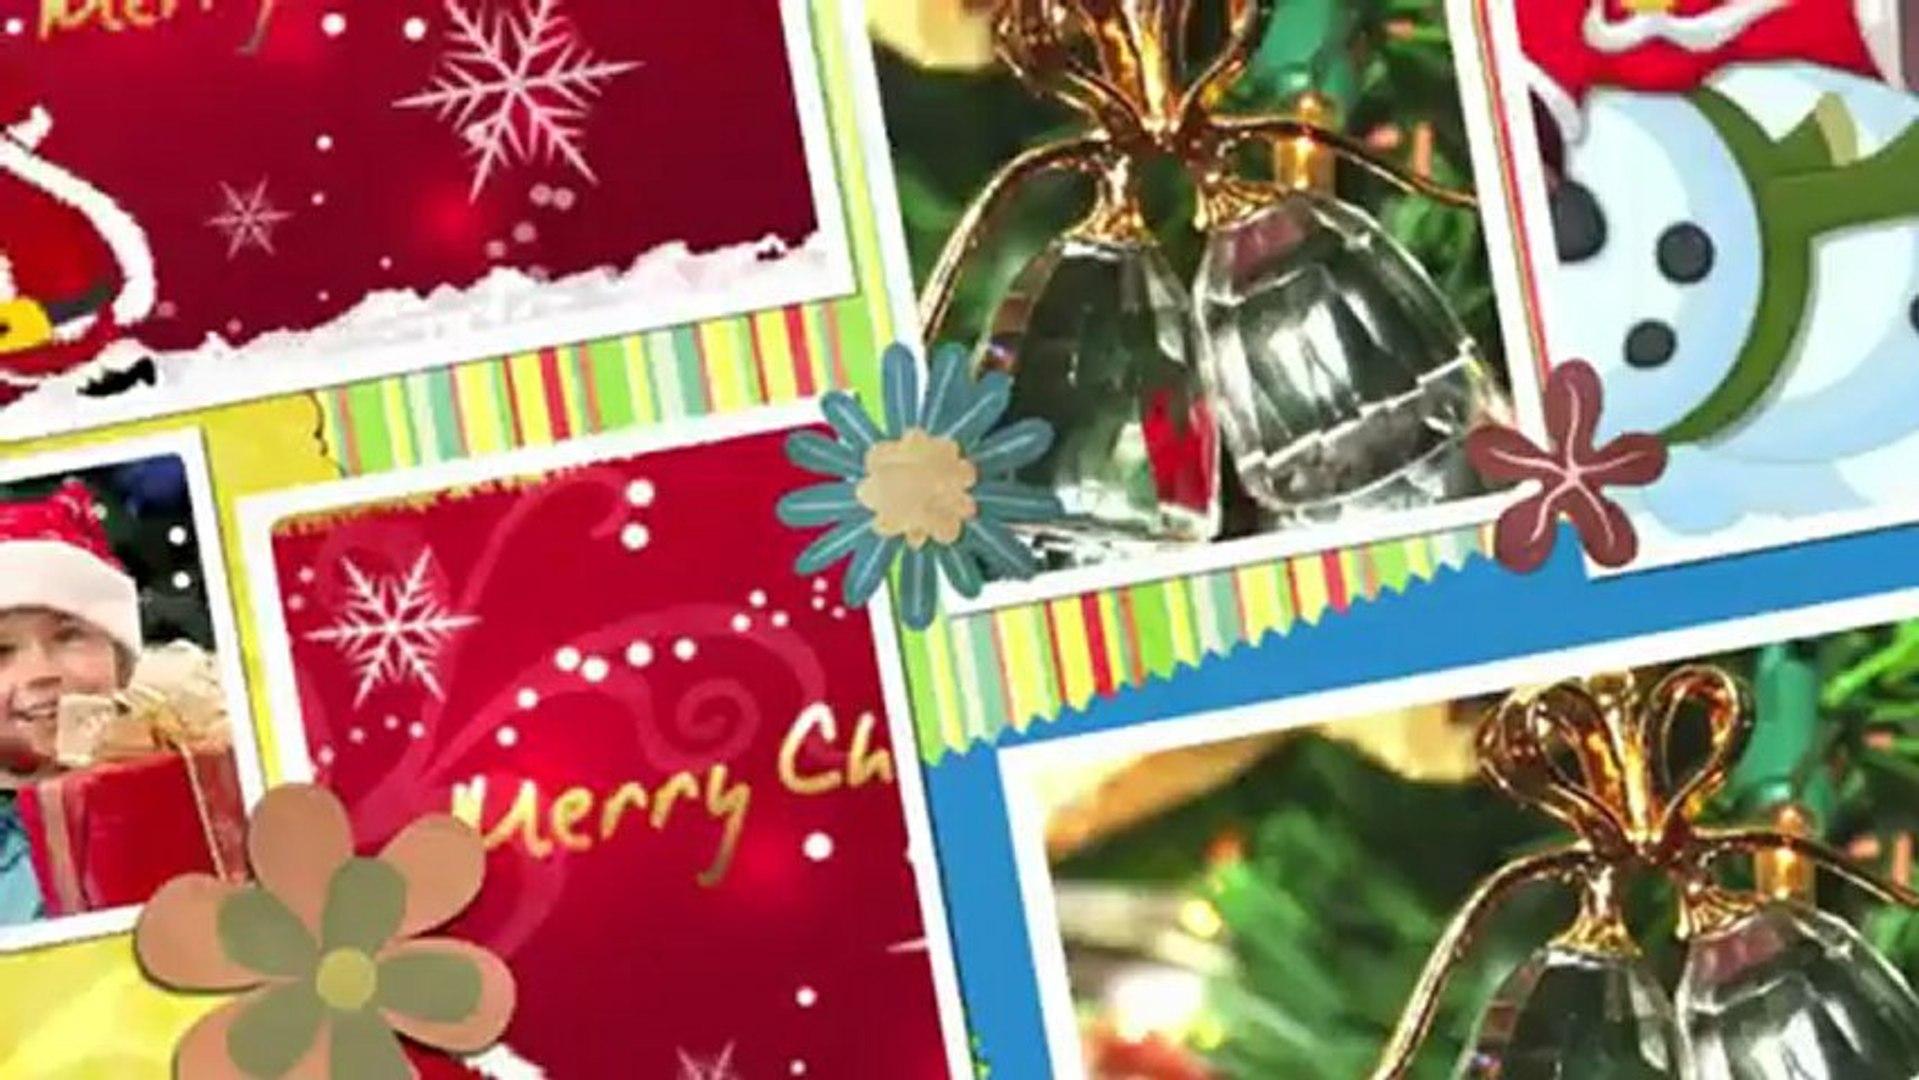 MERRY CHRISTMAS ! MERRY CHRISTMAS !